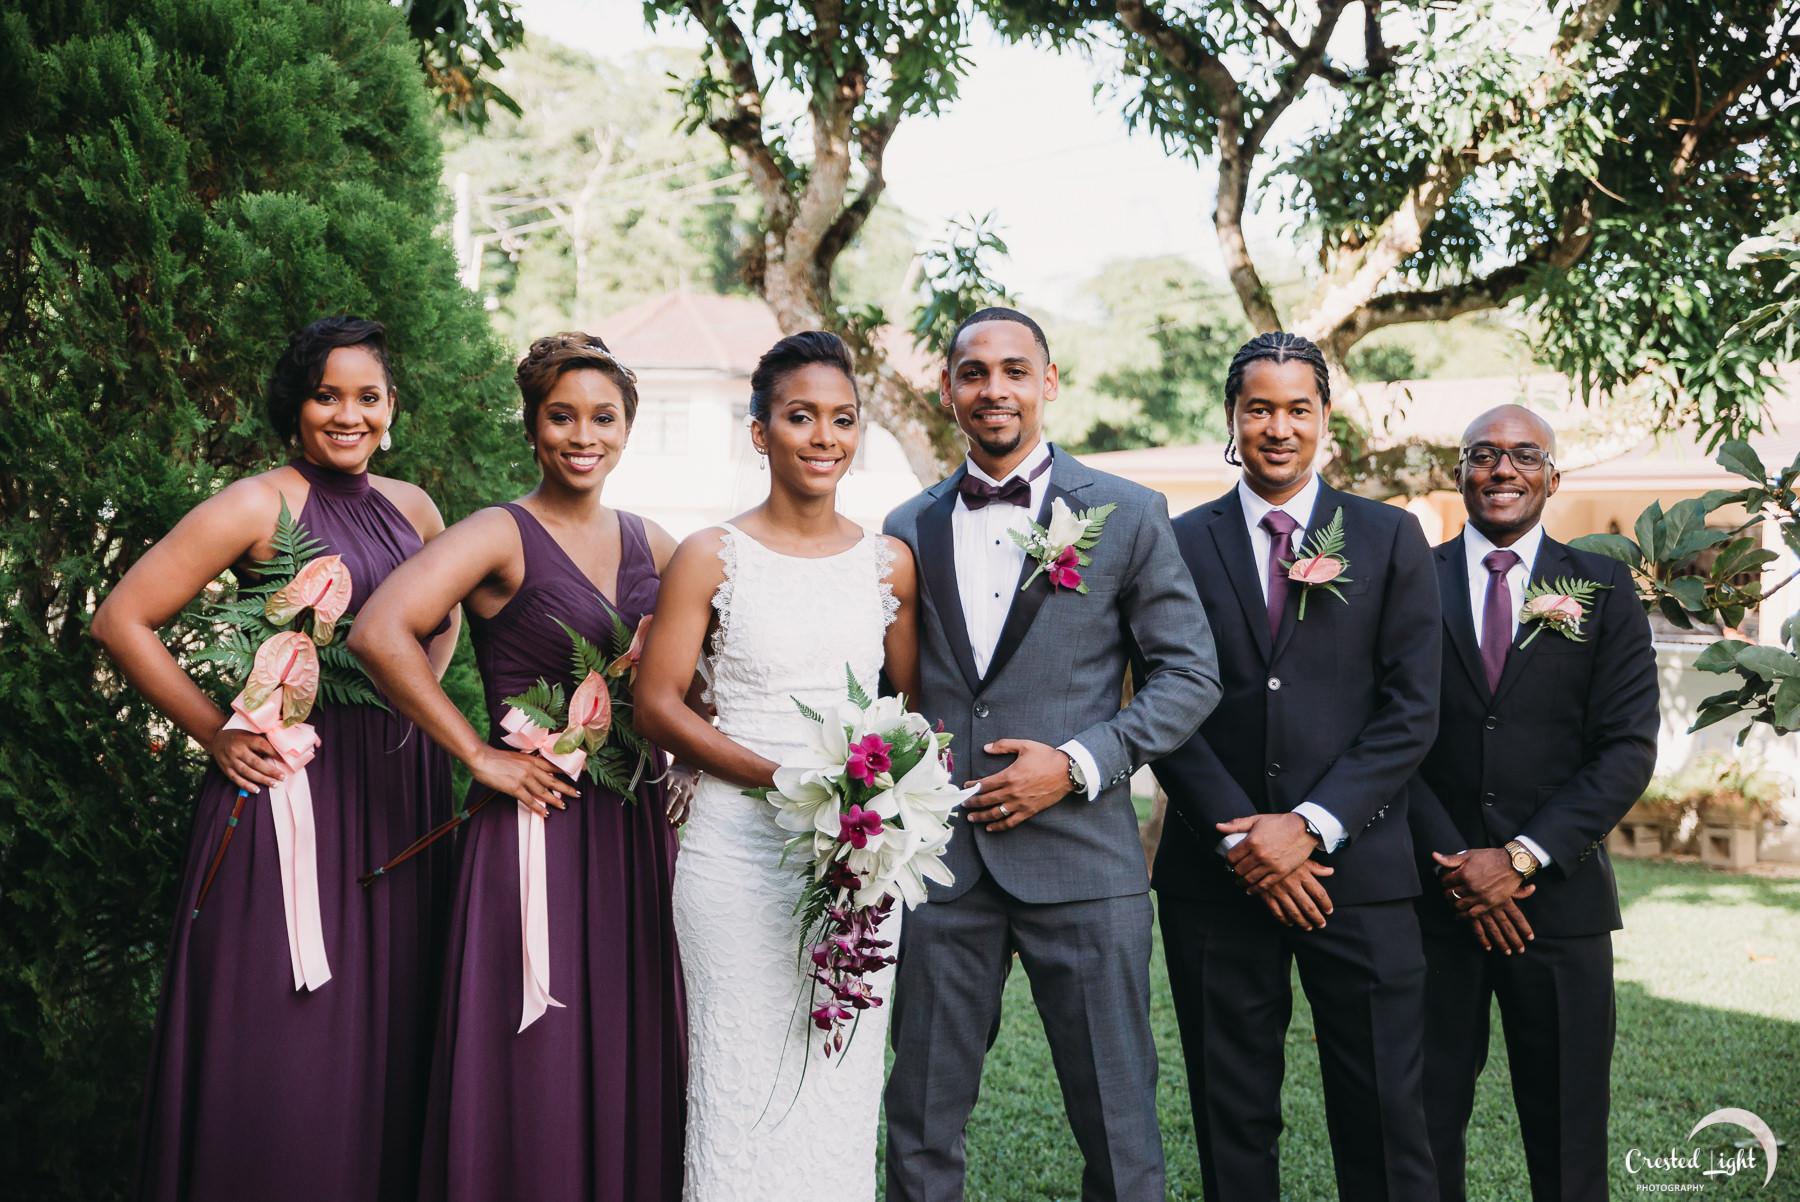 Santa Cruz Trinidad Wedding 02.jpg